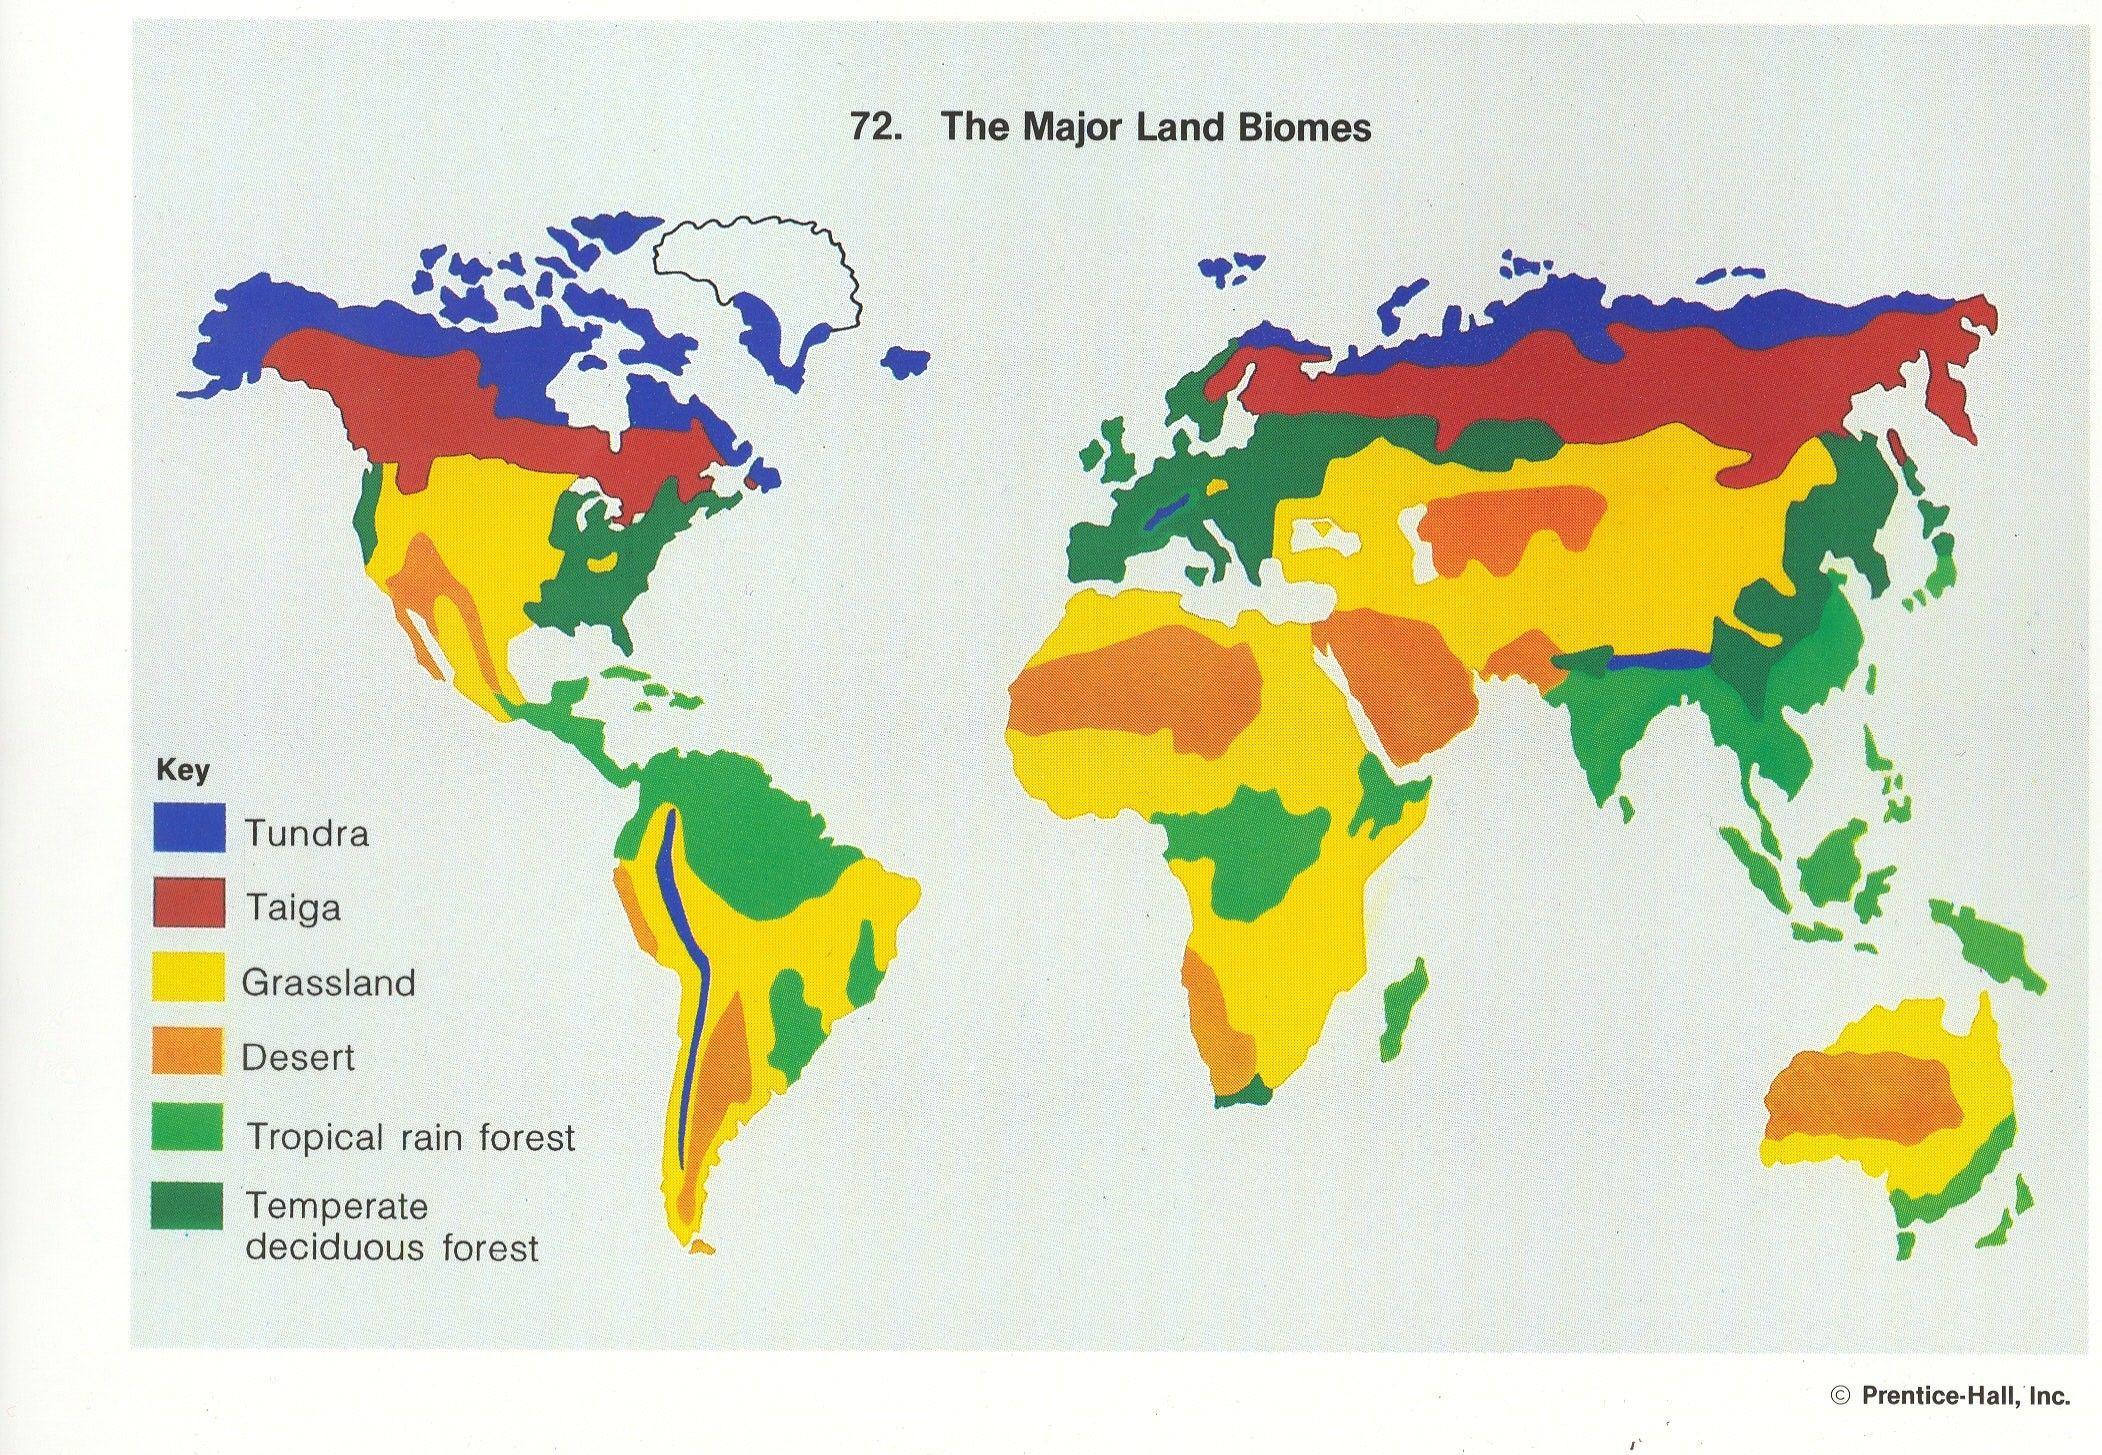 Land Biomes Worksheet Answers